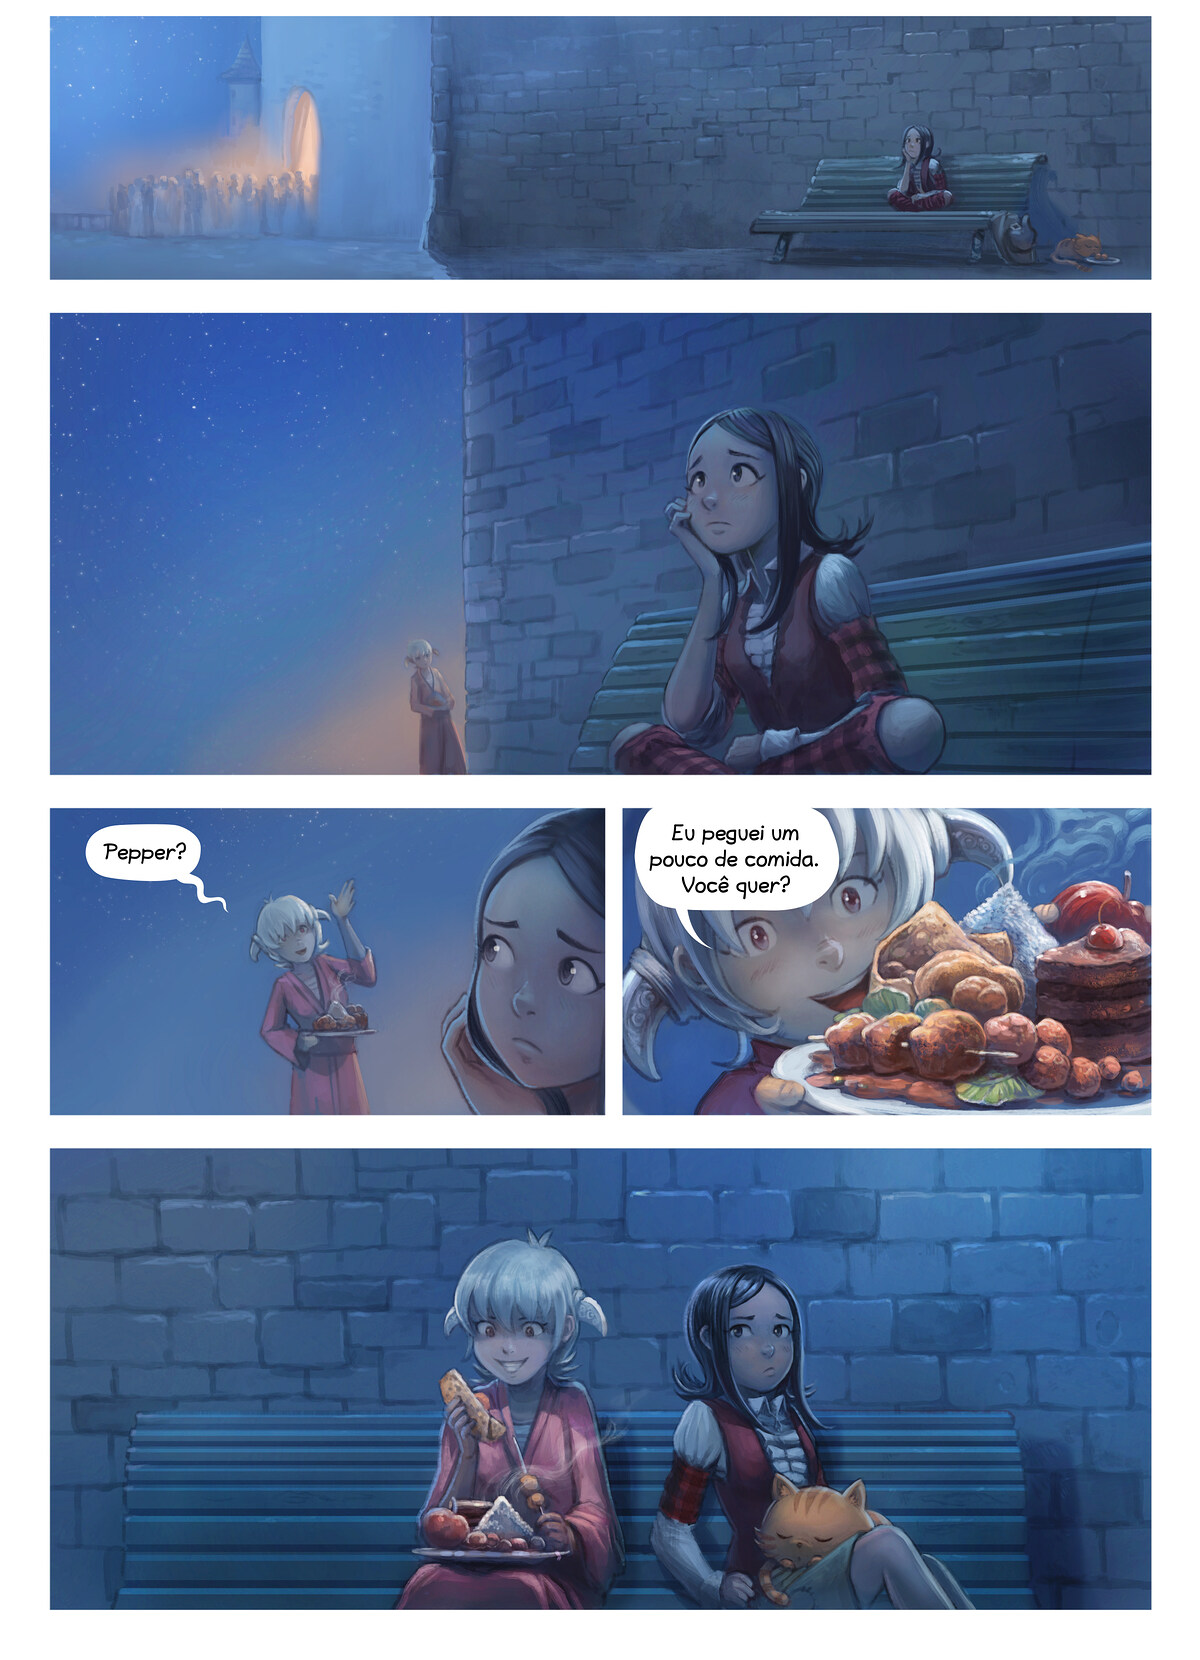 A webcomic page of Pepper&Carrot, episódio 28 [pt], página 6